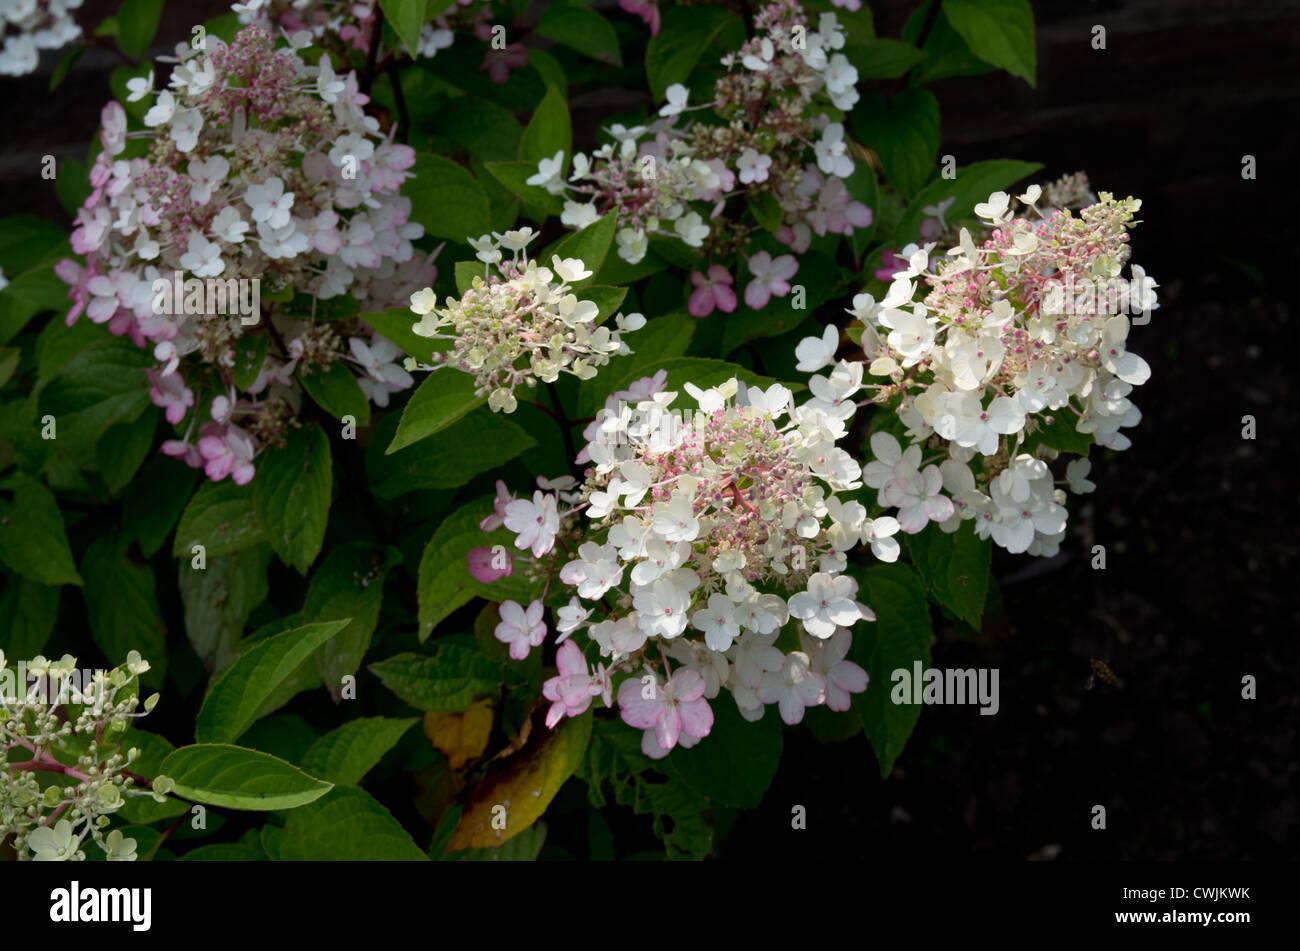 Hydrangea Paniculata 'Pinky Winky' - Stock Image